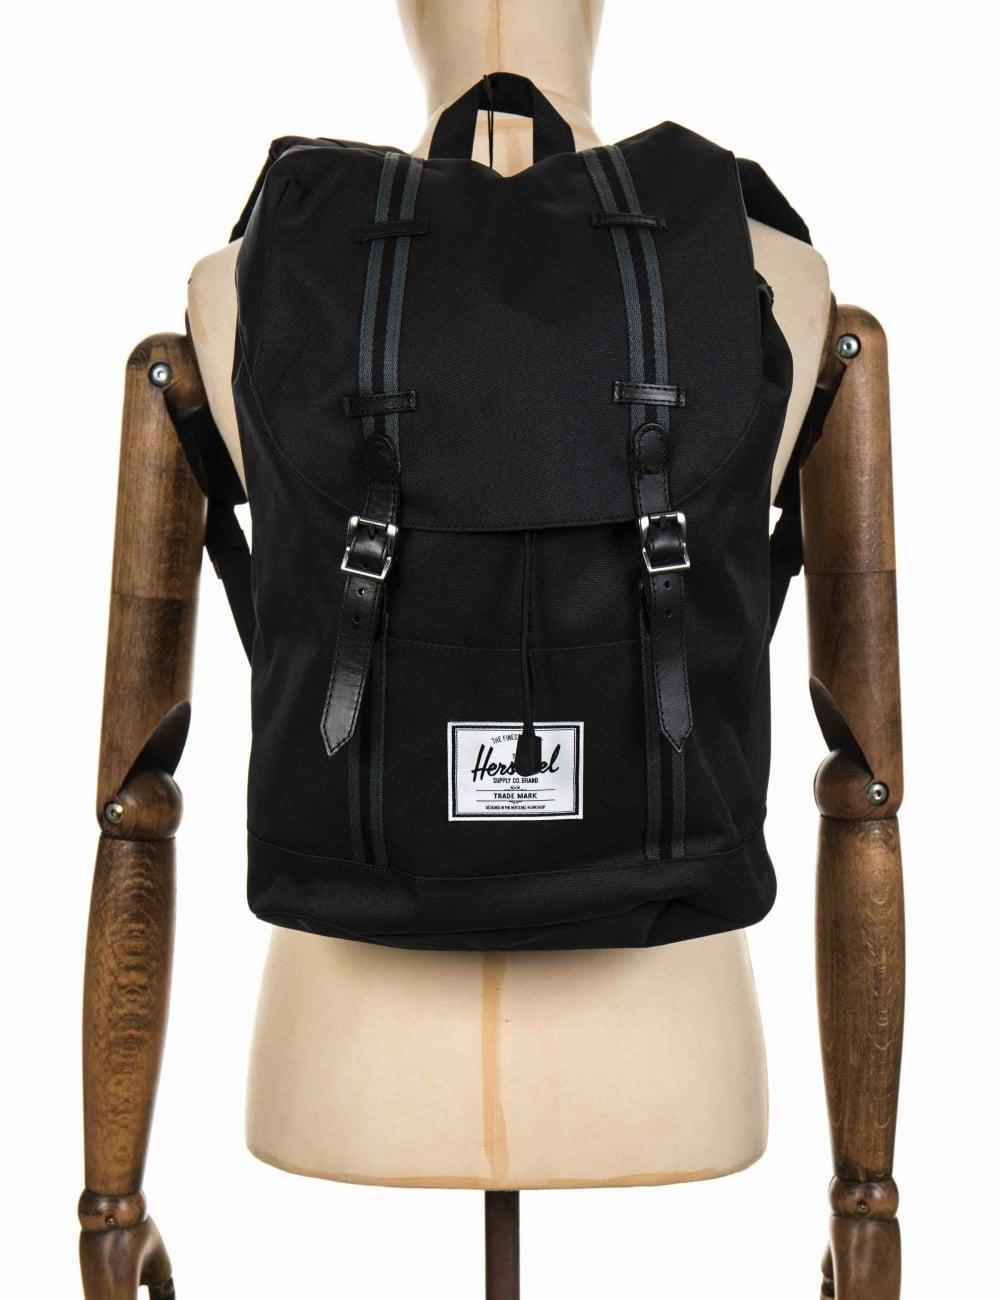 Herschel Supply Co Retreat 19.5L Backpack - Black Dark Shadow Black ... 247e101cf2a99